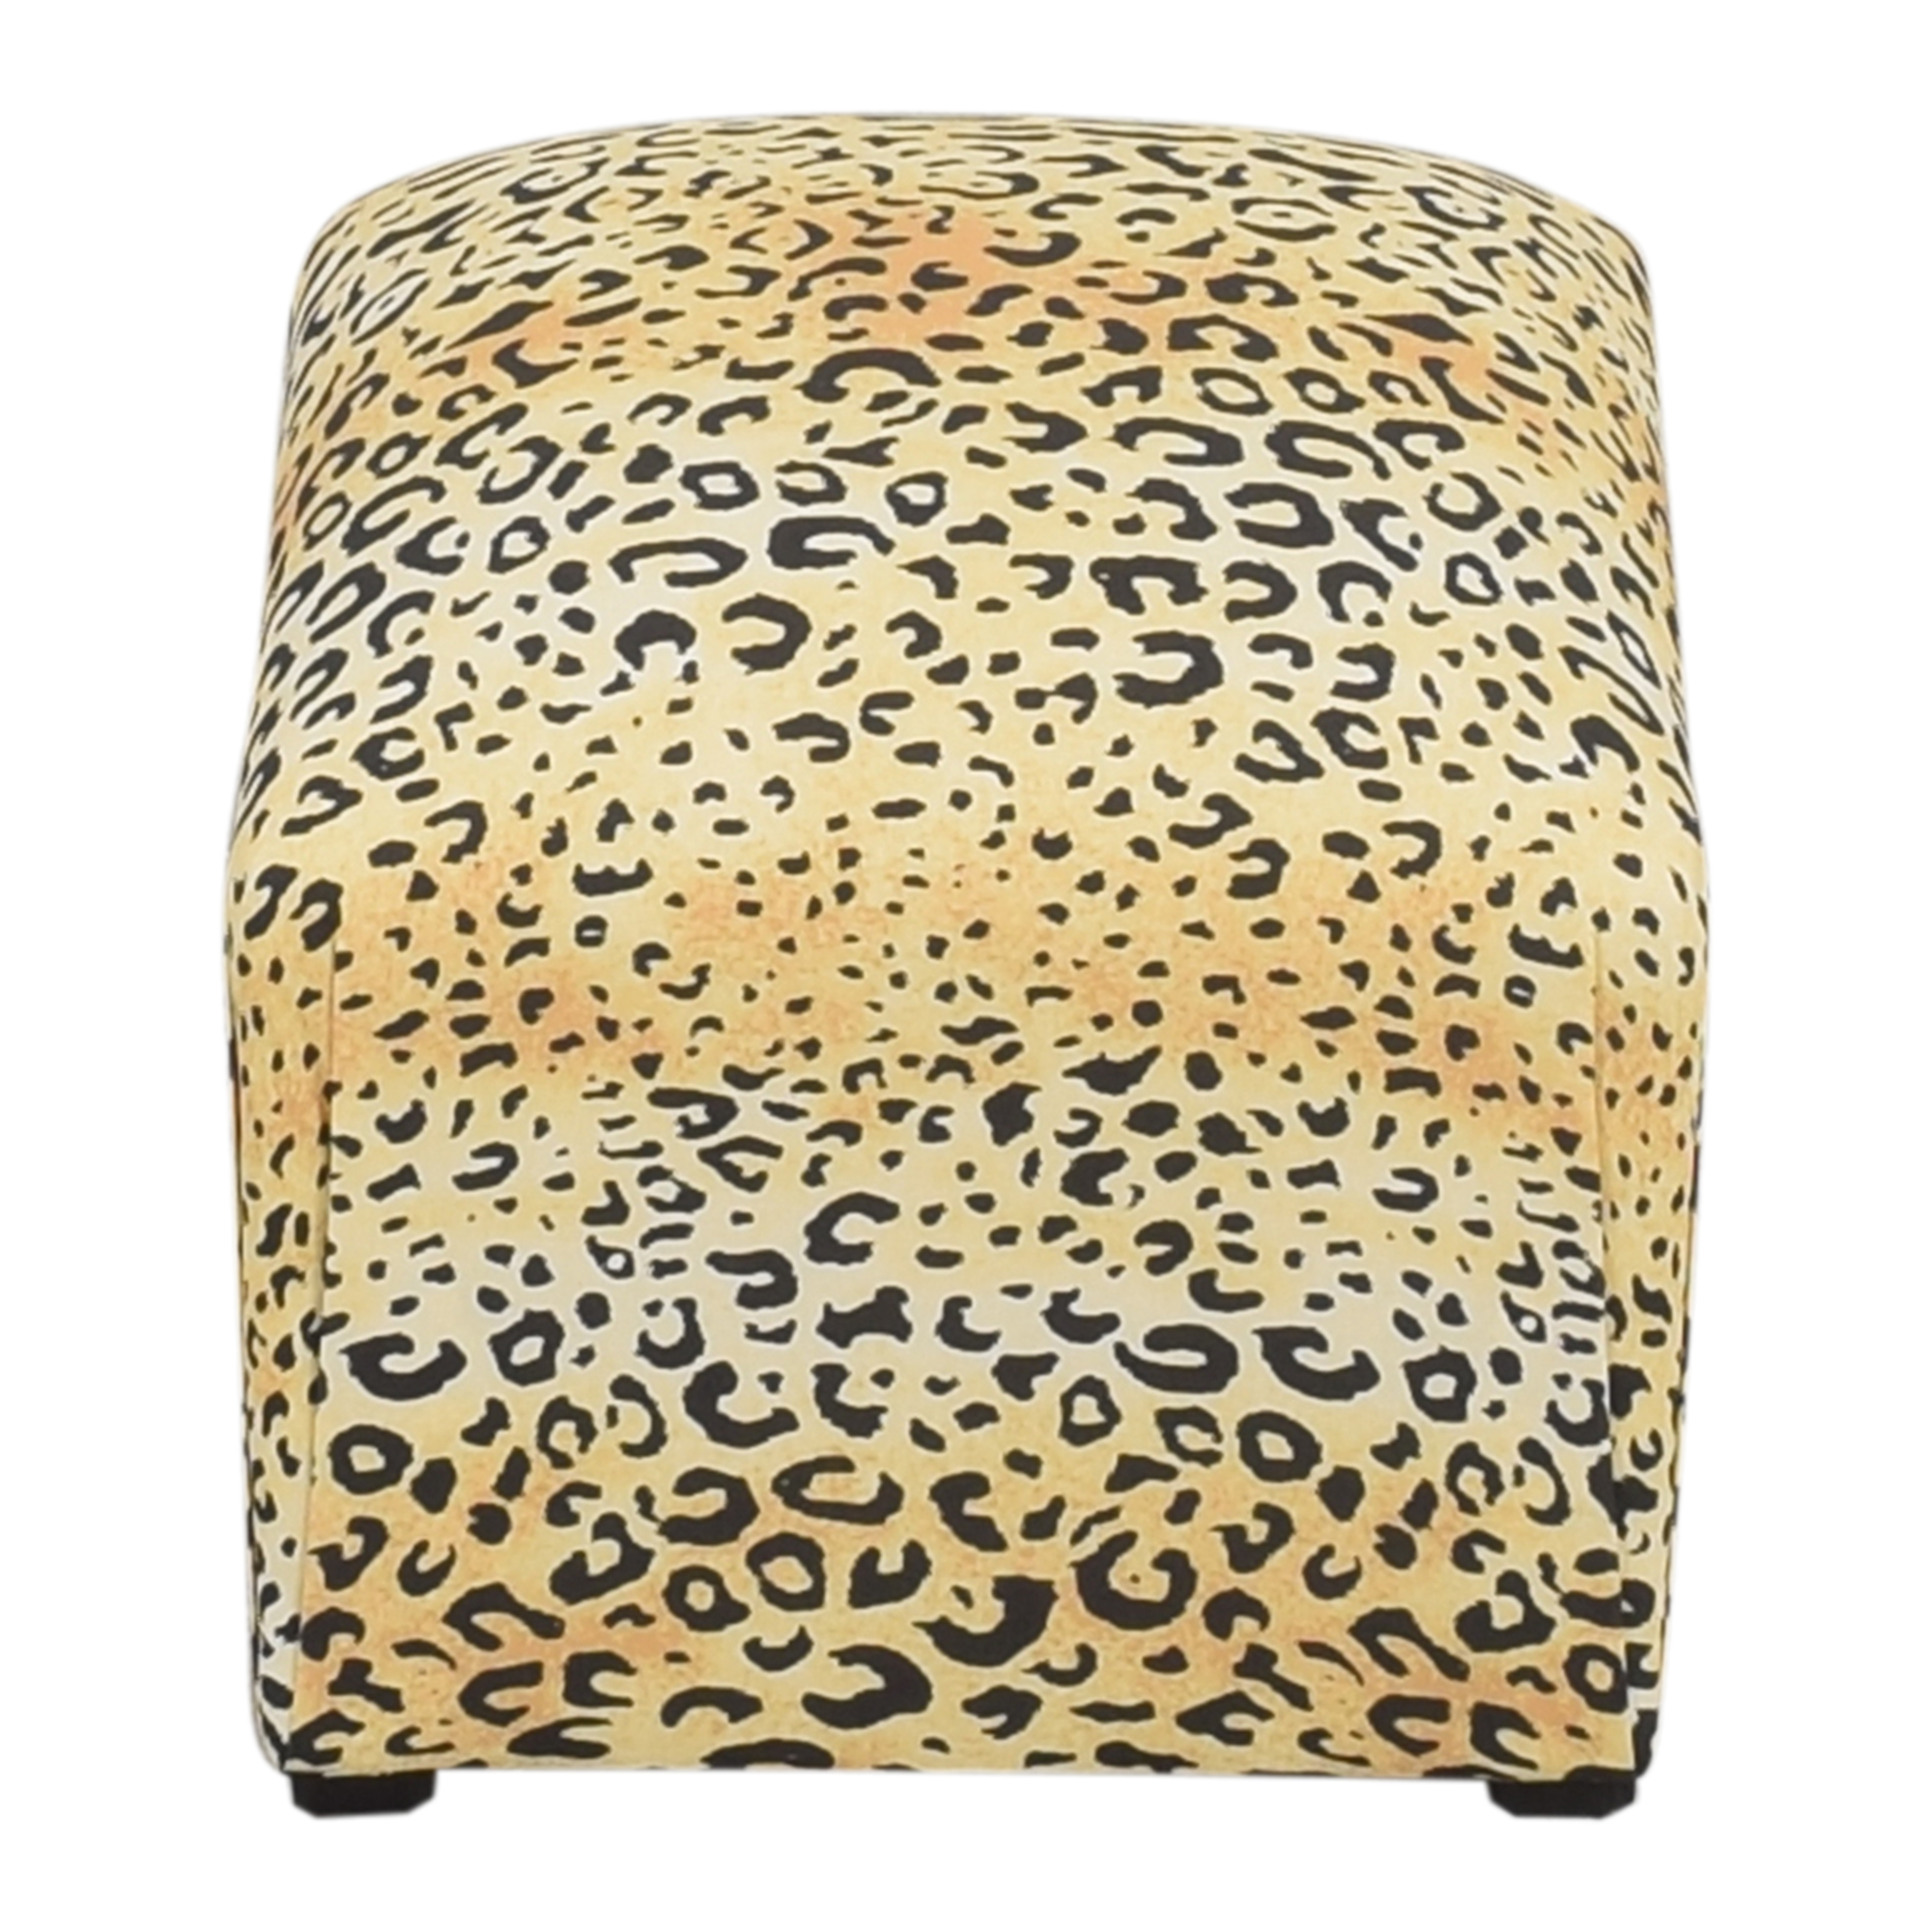 shop The Inside Leopard Deco Ottoman The Inside